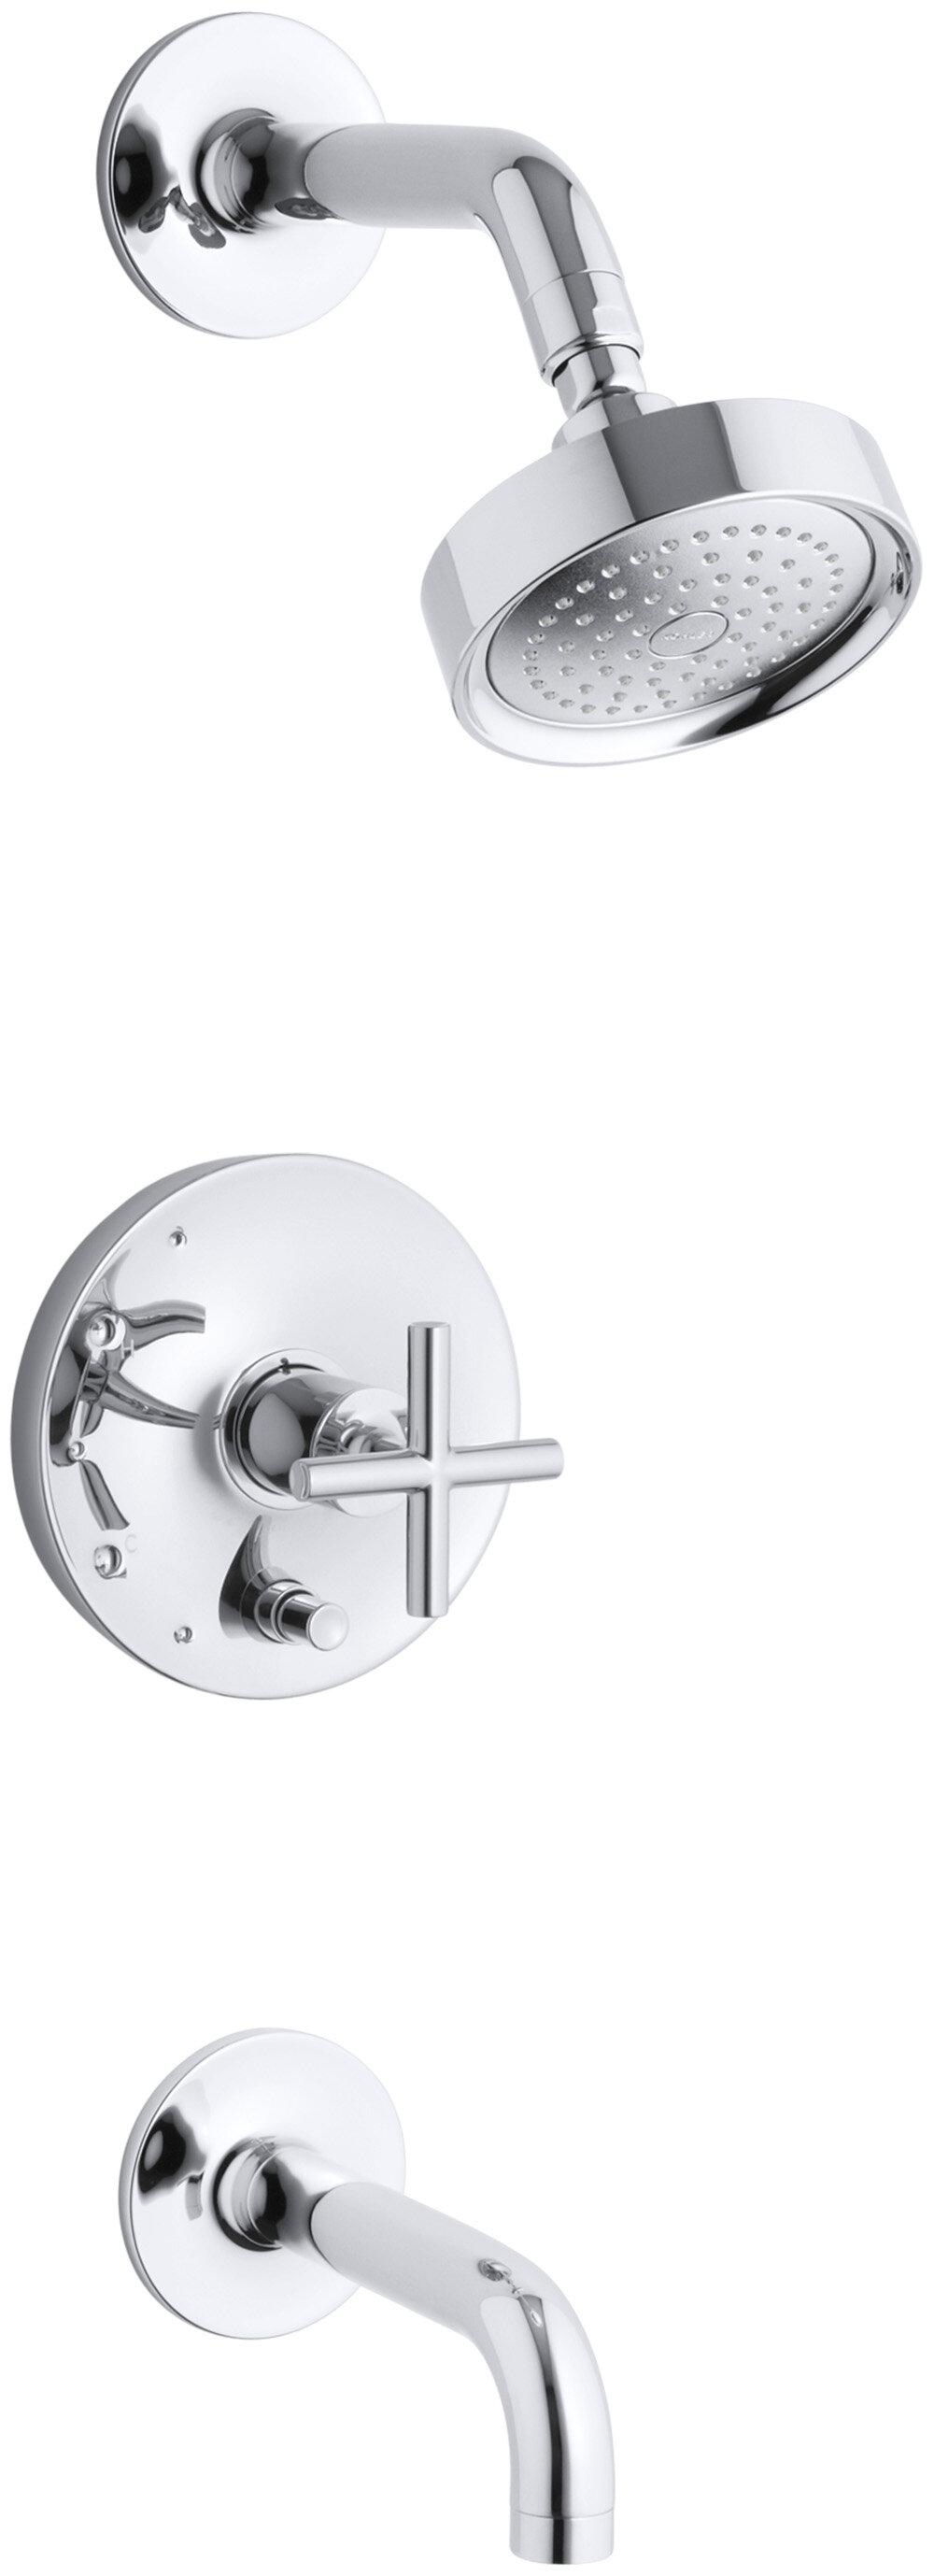 faucet larger dp handle multichoice view valve unbxhf only universal delta shower